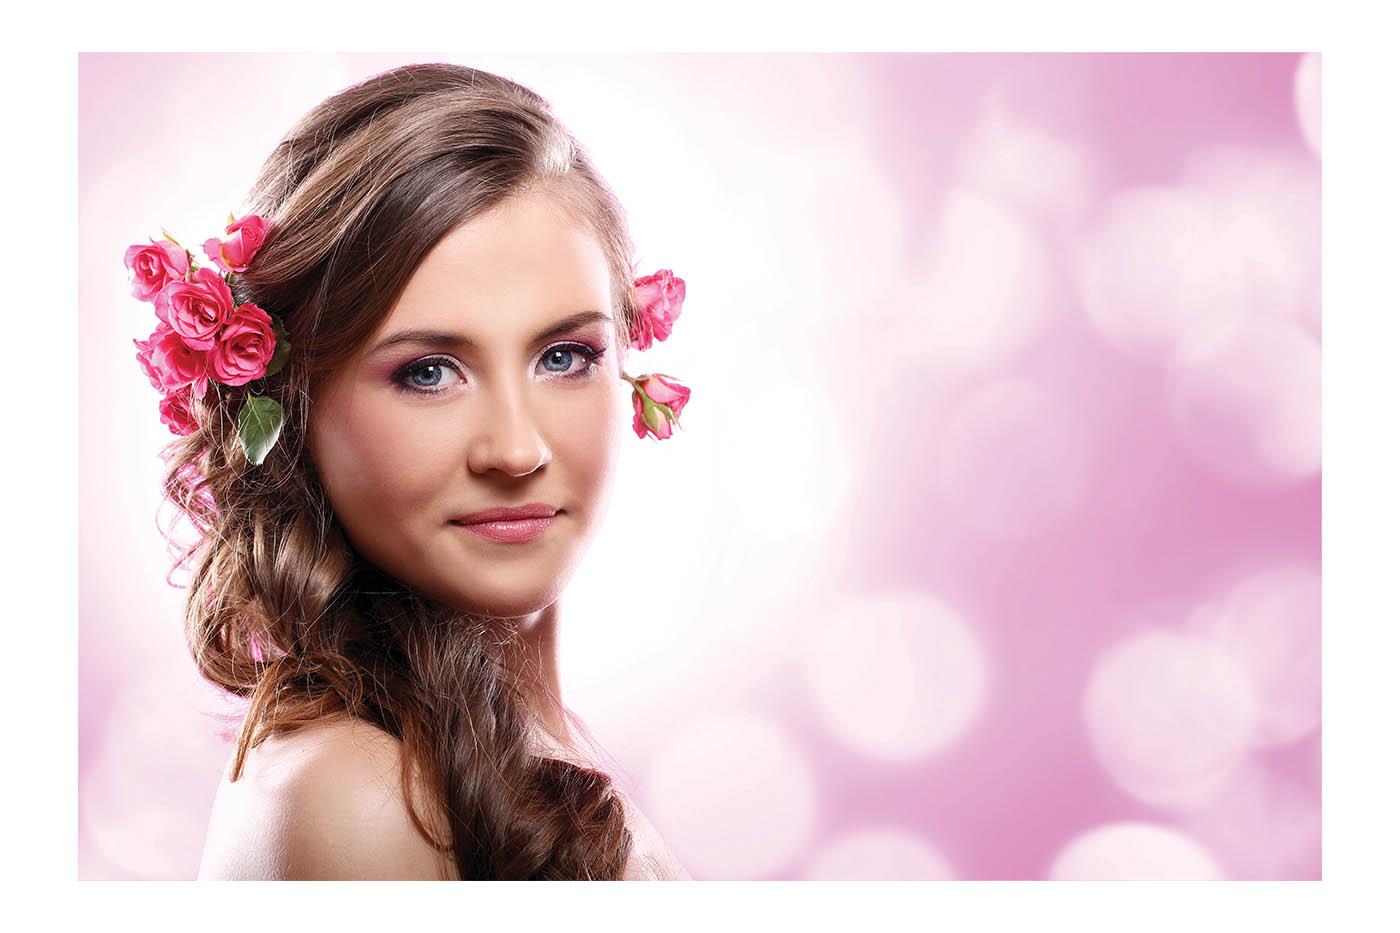 Pre-wedding skincare regimen for brides and grooms